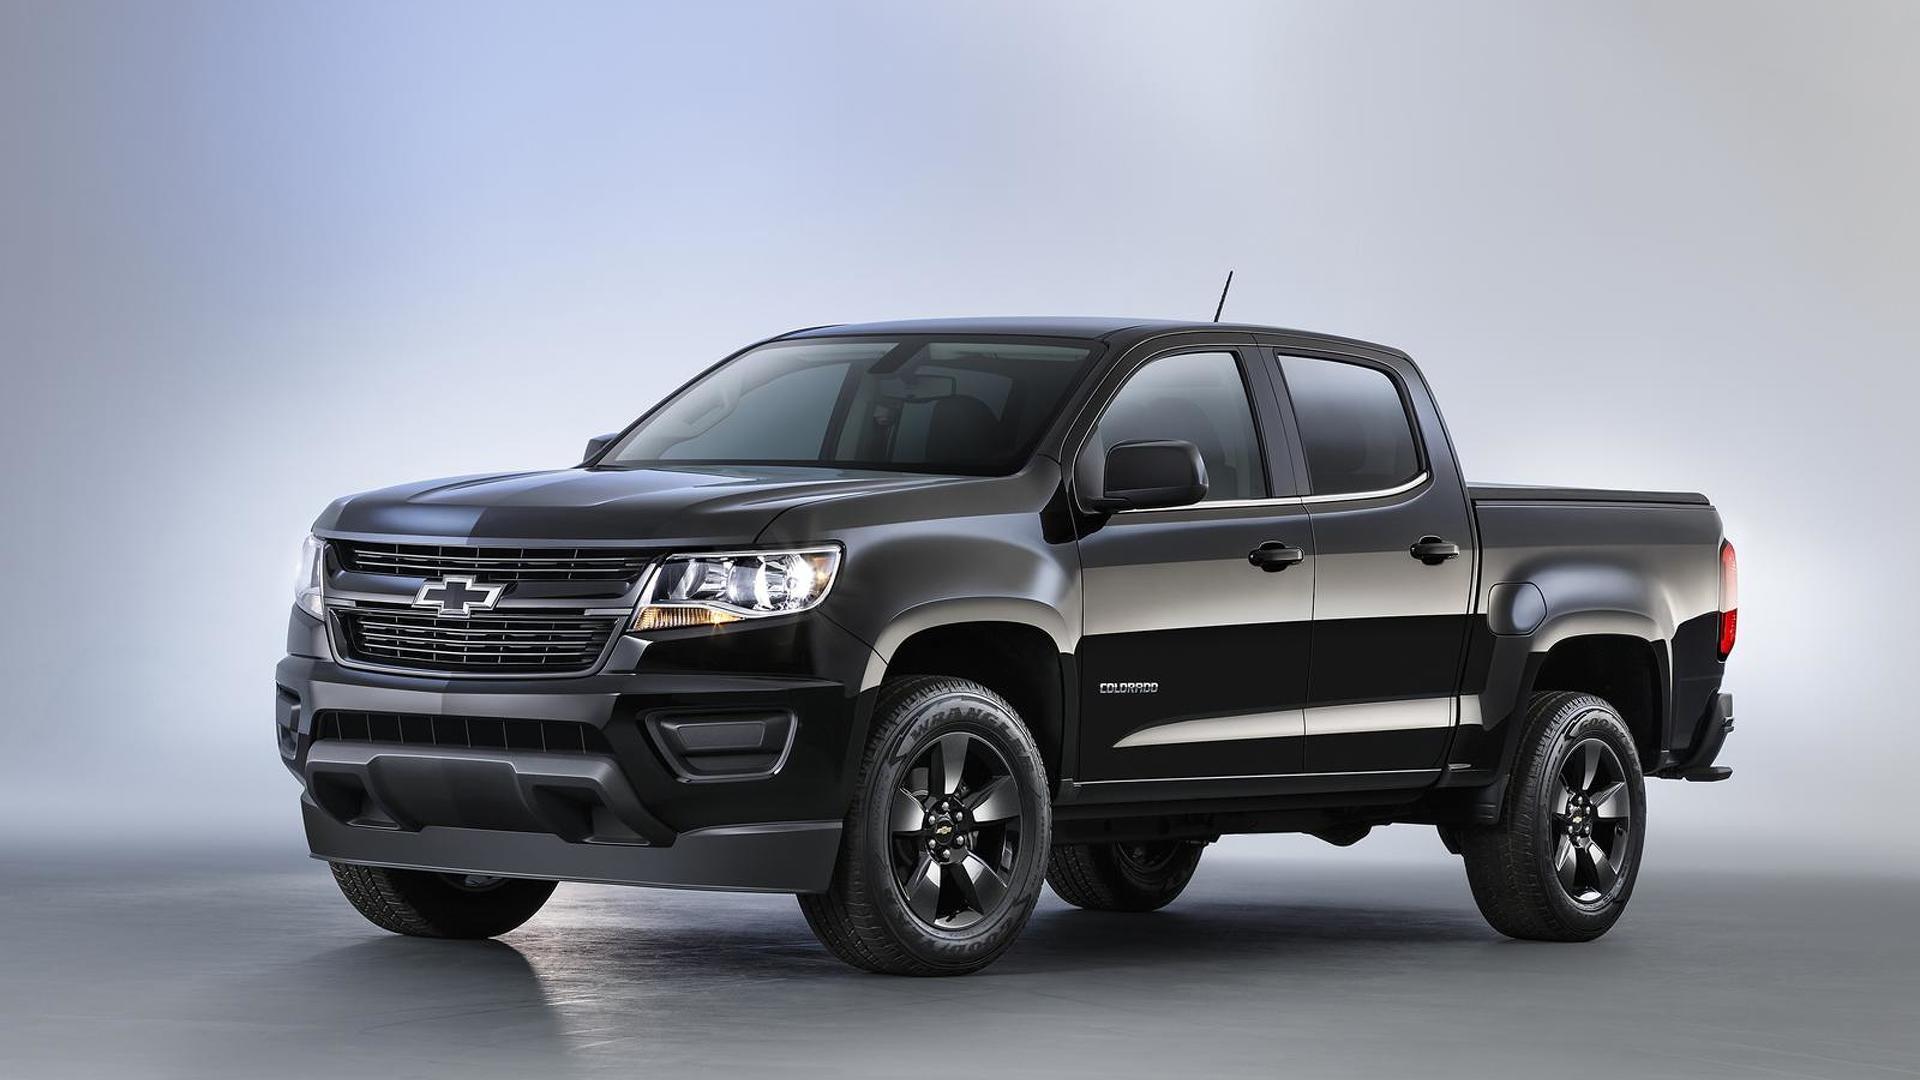 2017 Chevrolet Colorado boasts new V6 and eight-speed auto